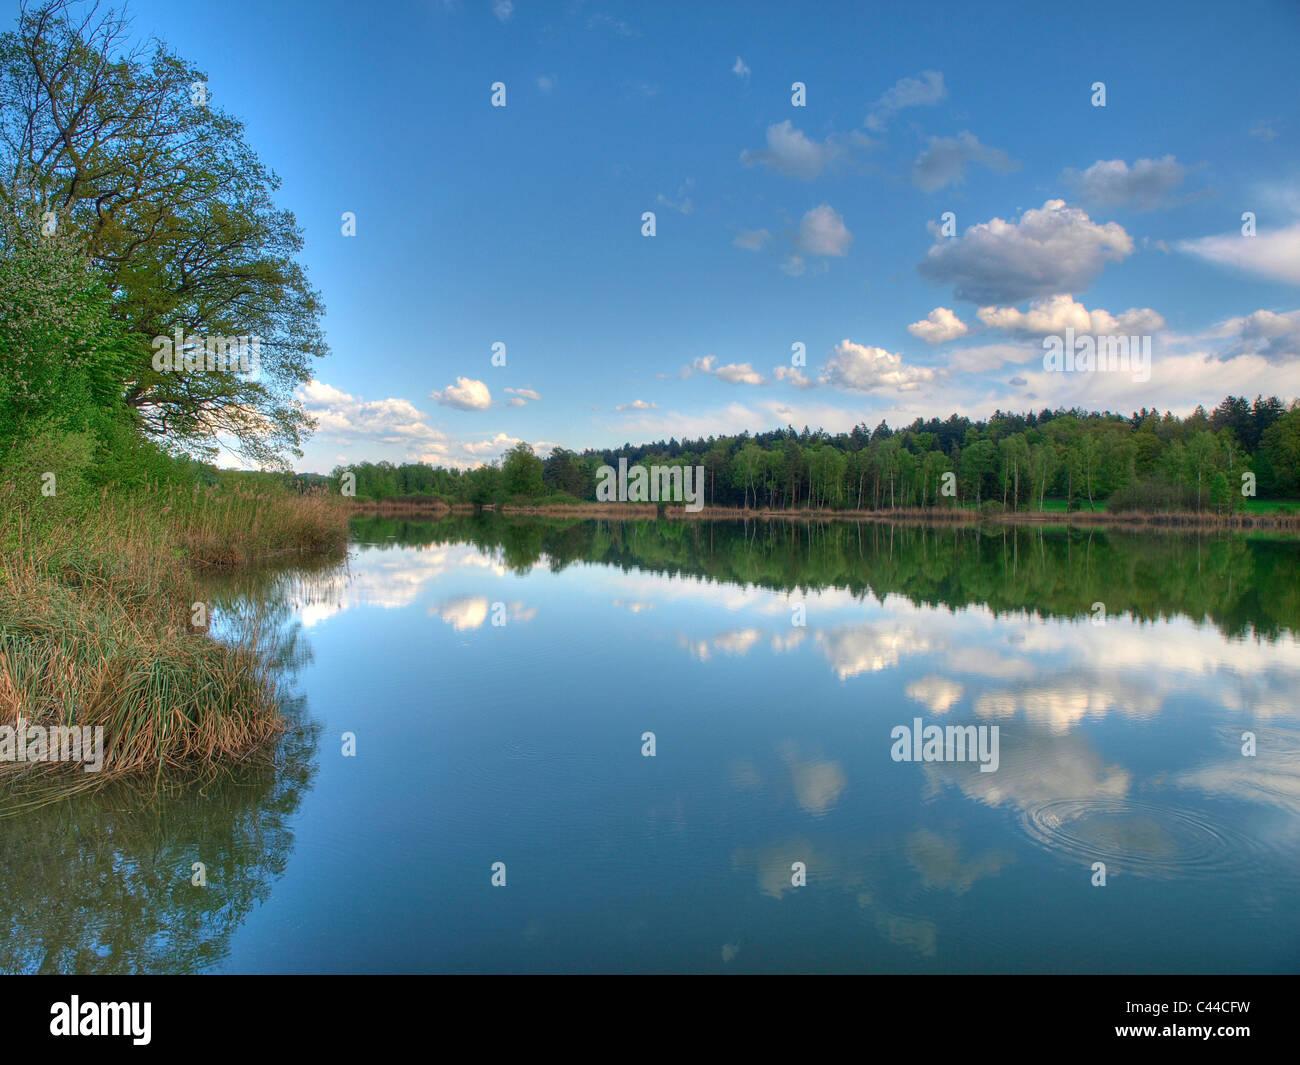 Blau, Feder, Himmel, Idylle, See, Holz, Wald, Wasser, Wolken, Kanton Zürich, Schweiz, Husemersee, See, Ossingen, Stockbild